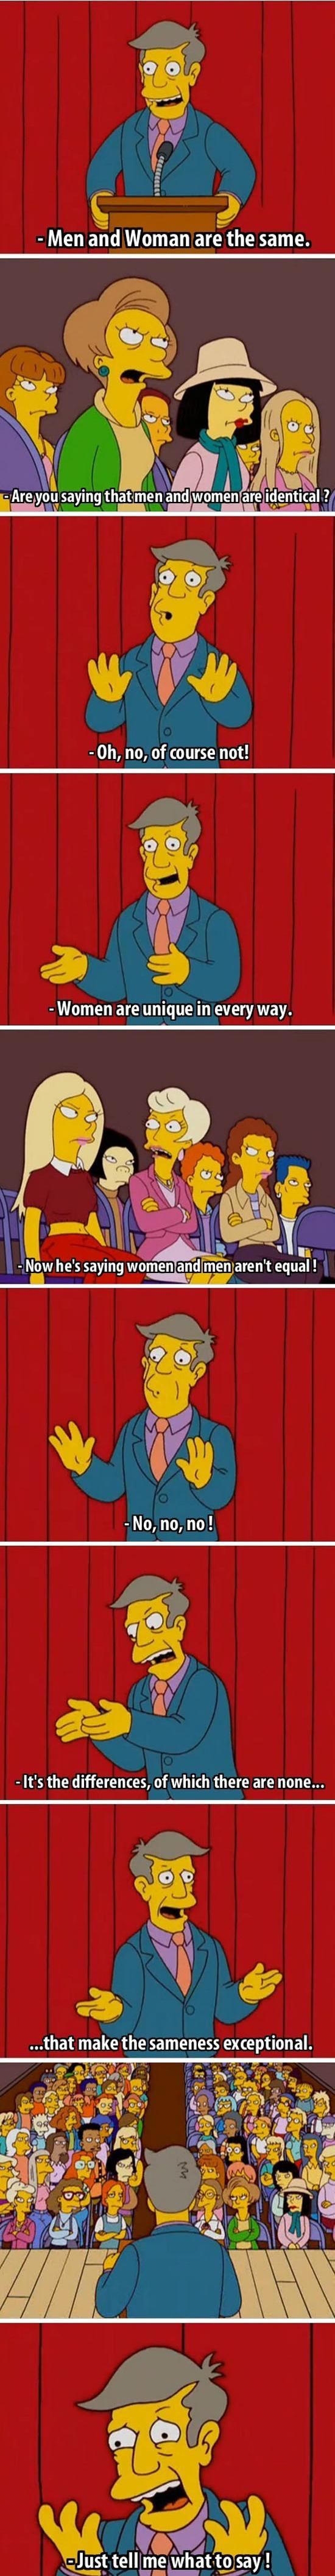 principal-skinner-on-gender-equality